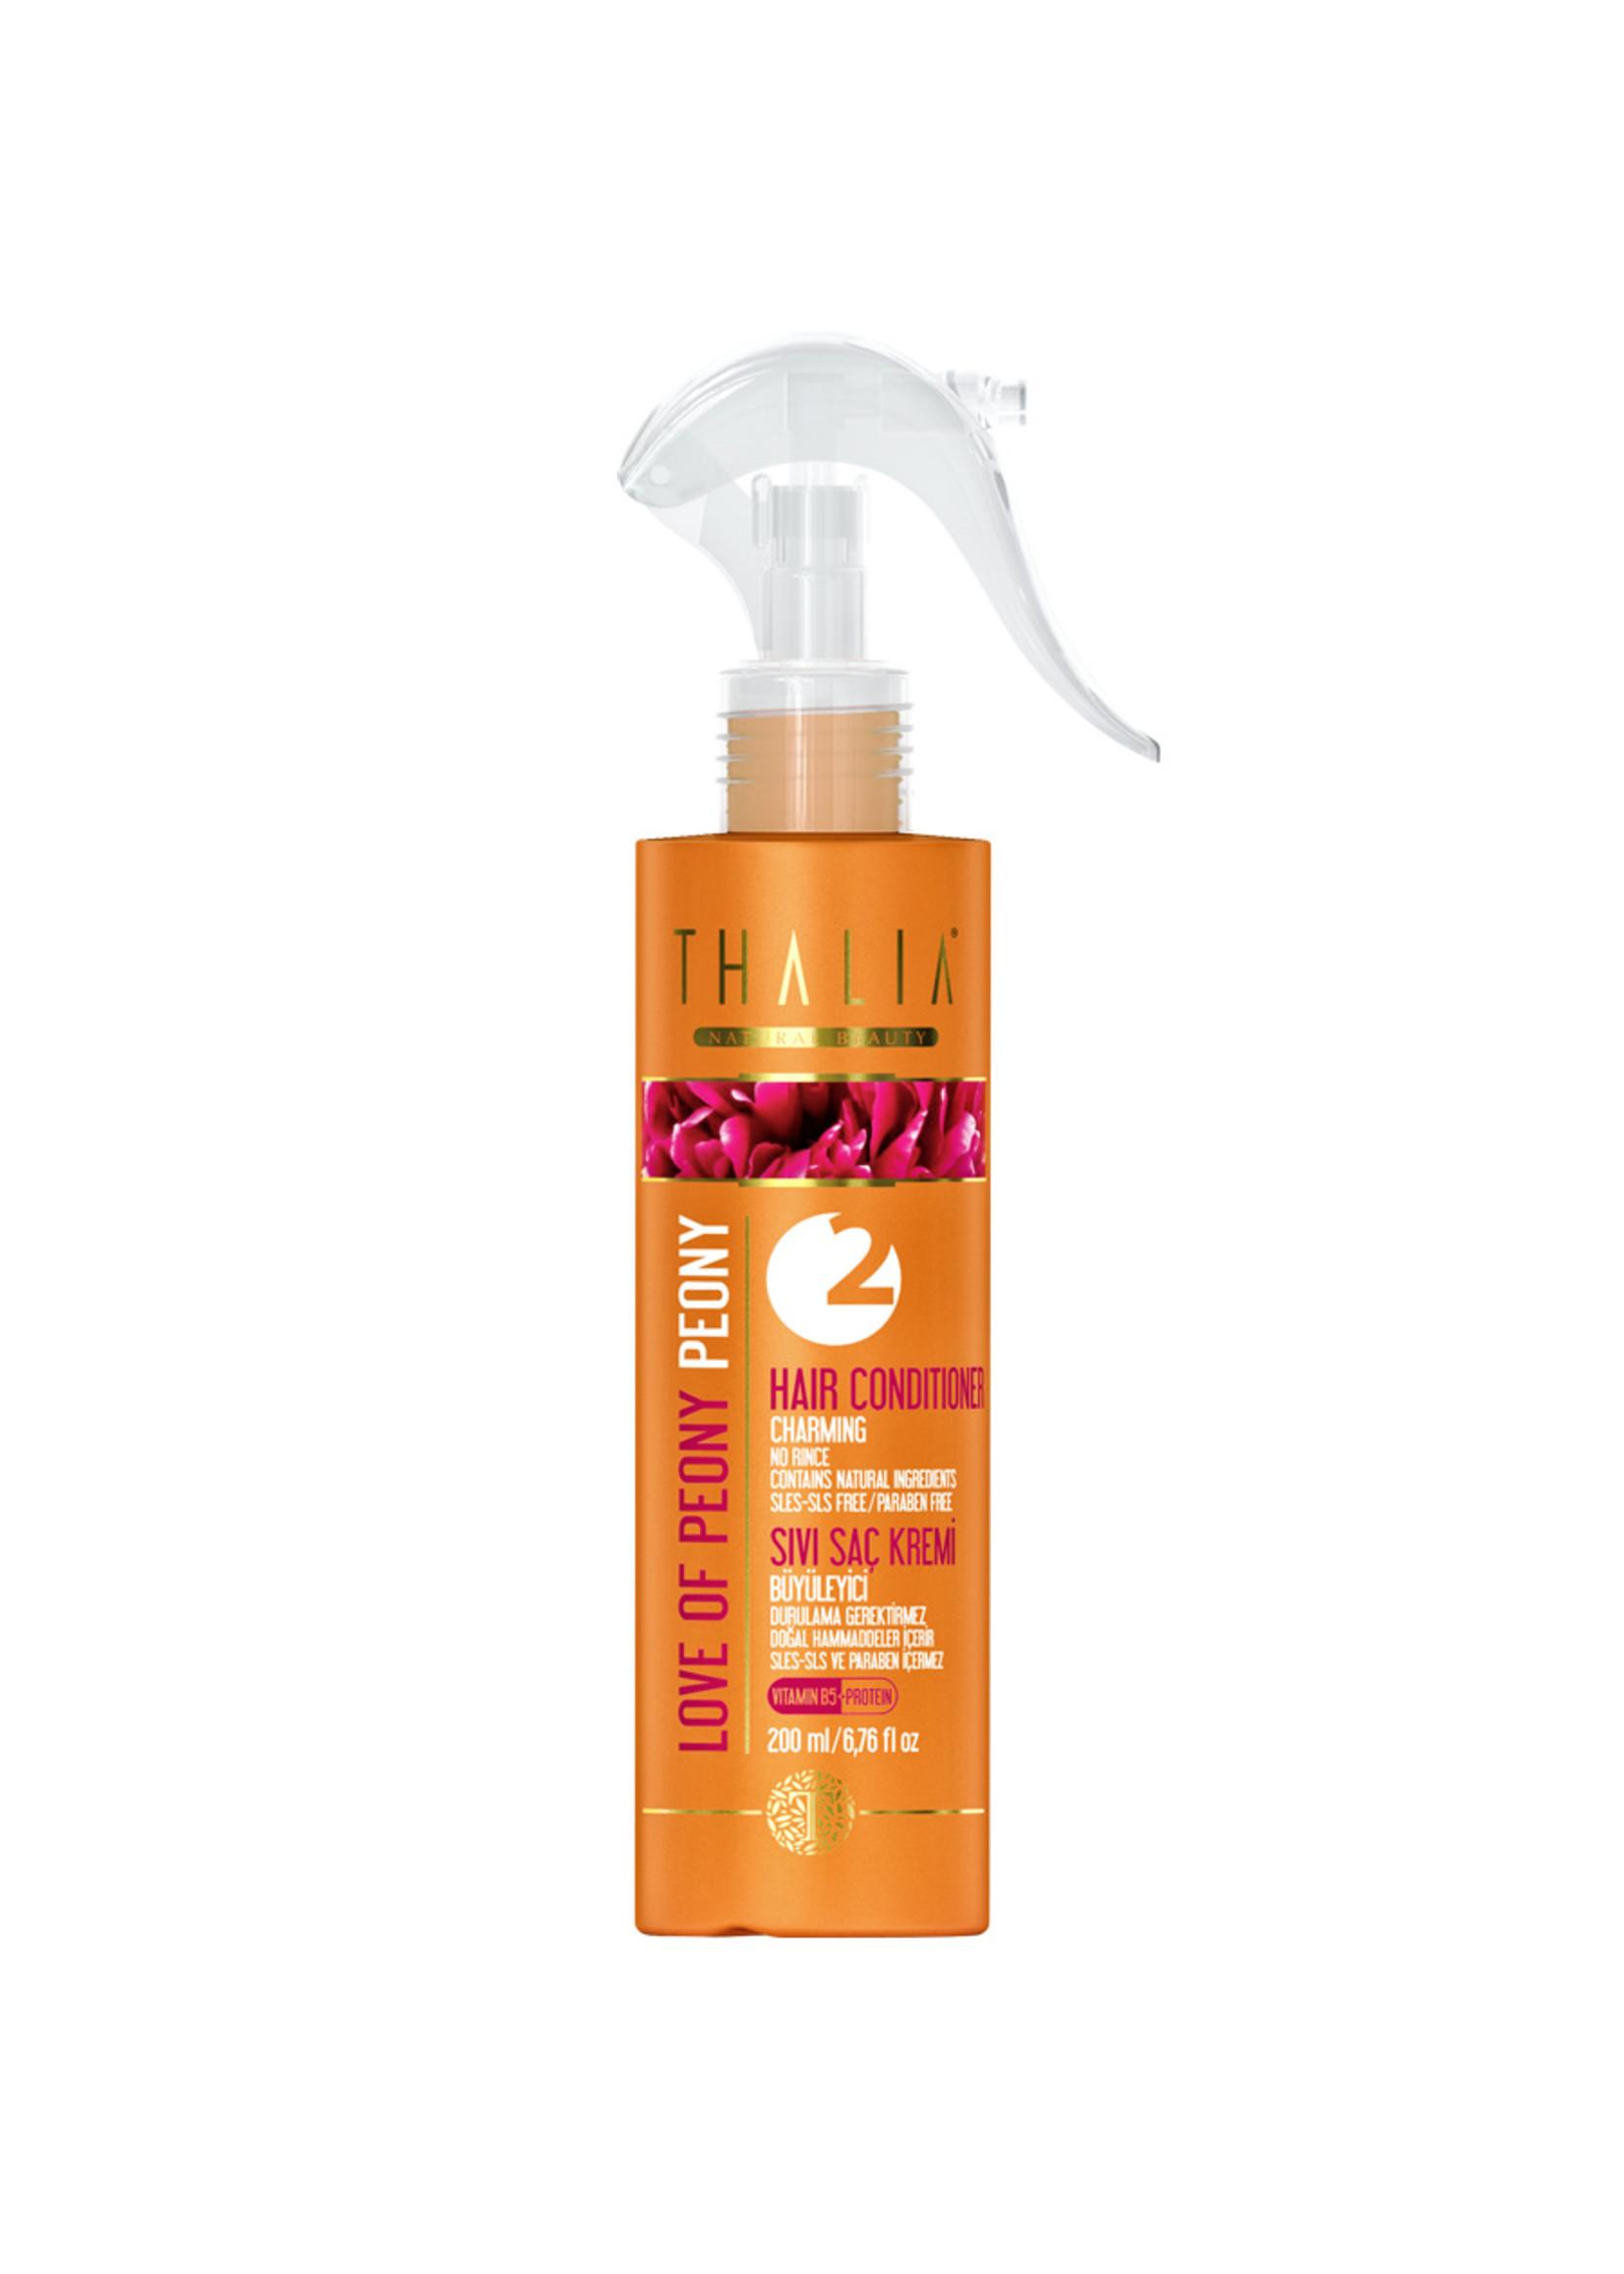 Thalia Pioenroos Leave-in Conditioner 200 ml